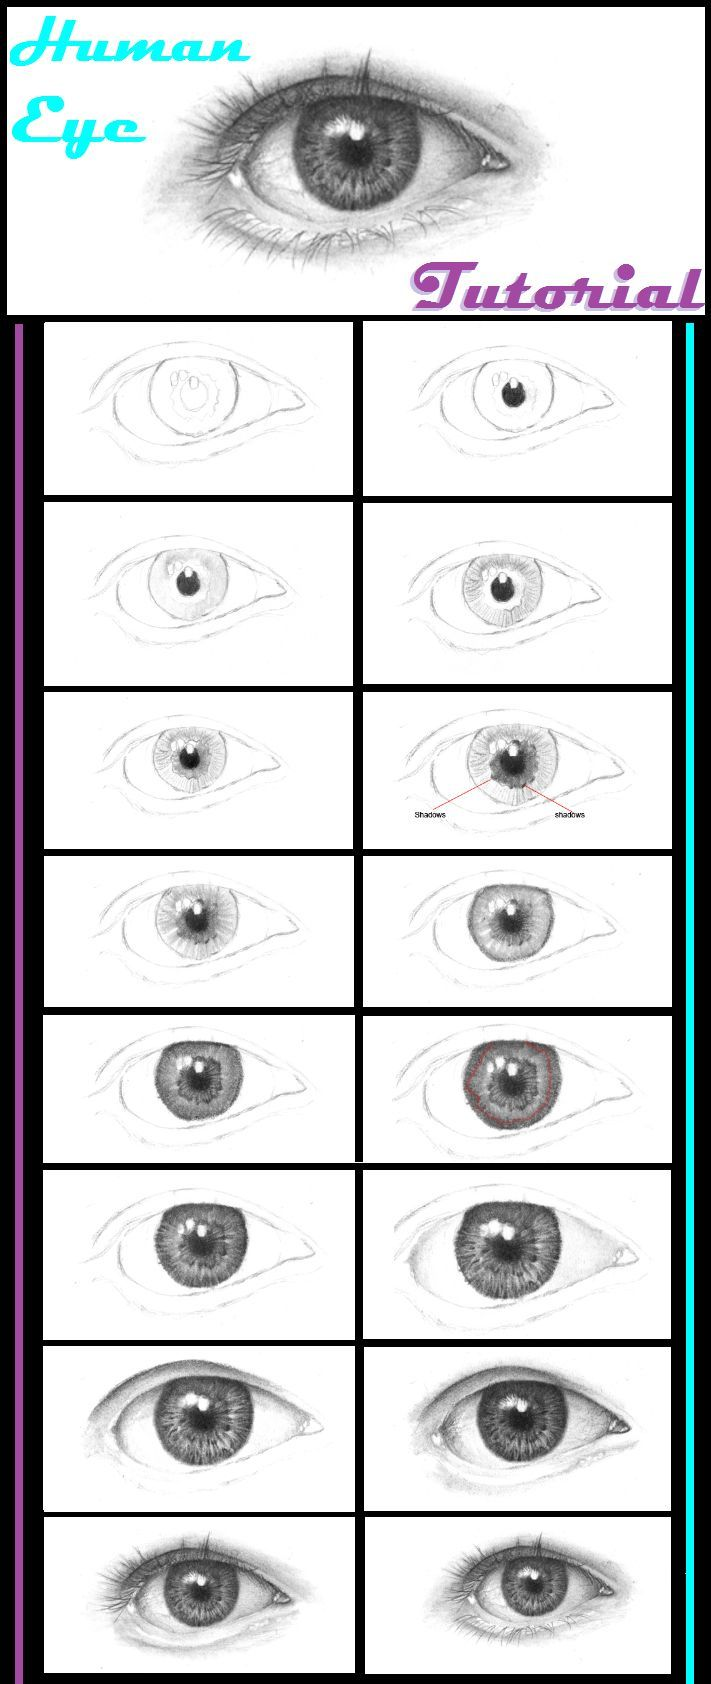 How to draw a human eye. #human_eye_tutorial: